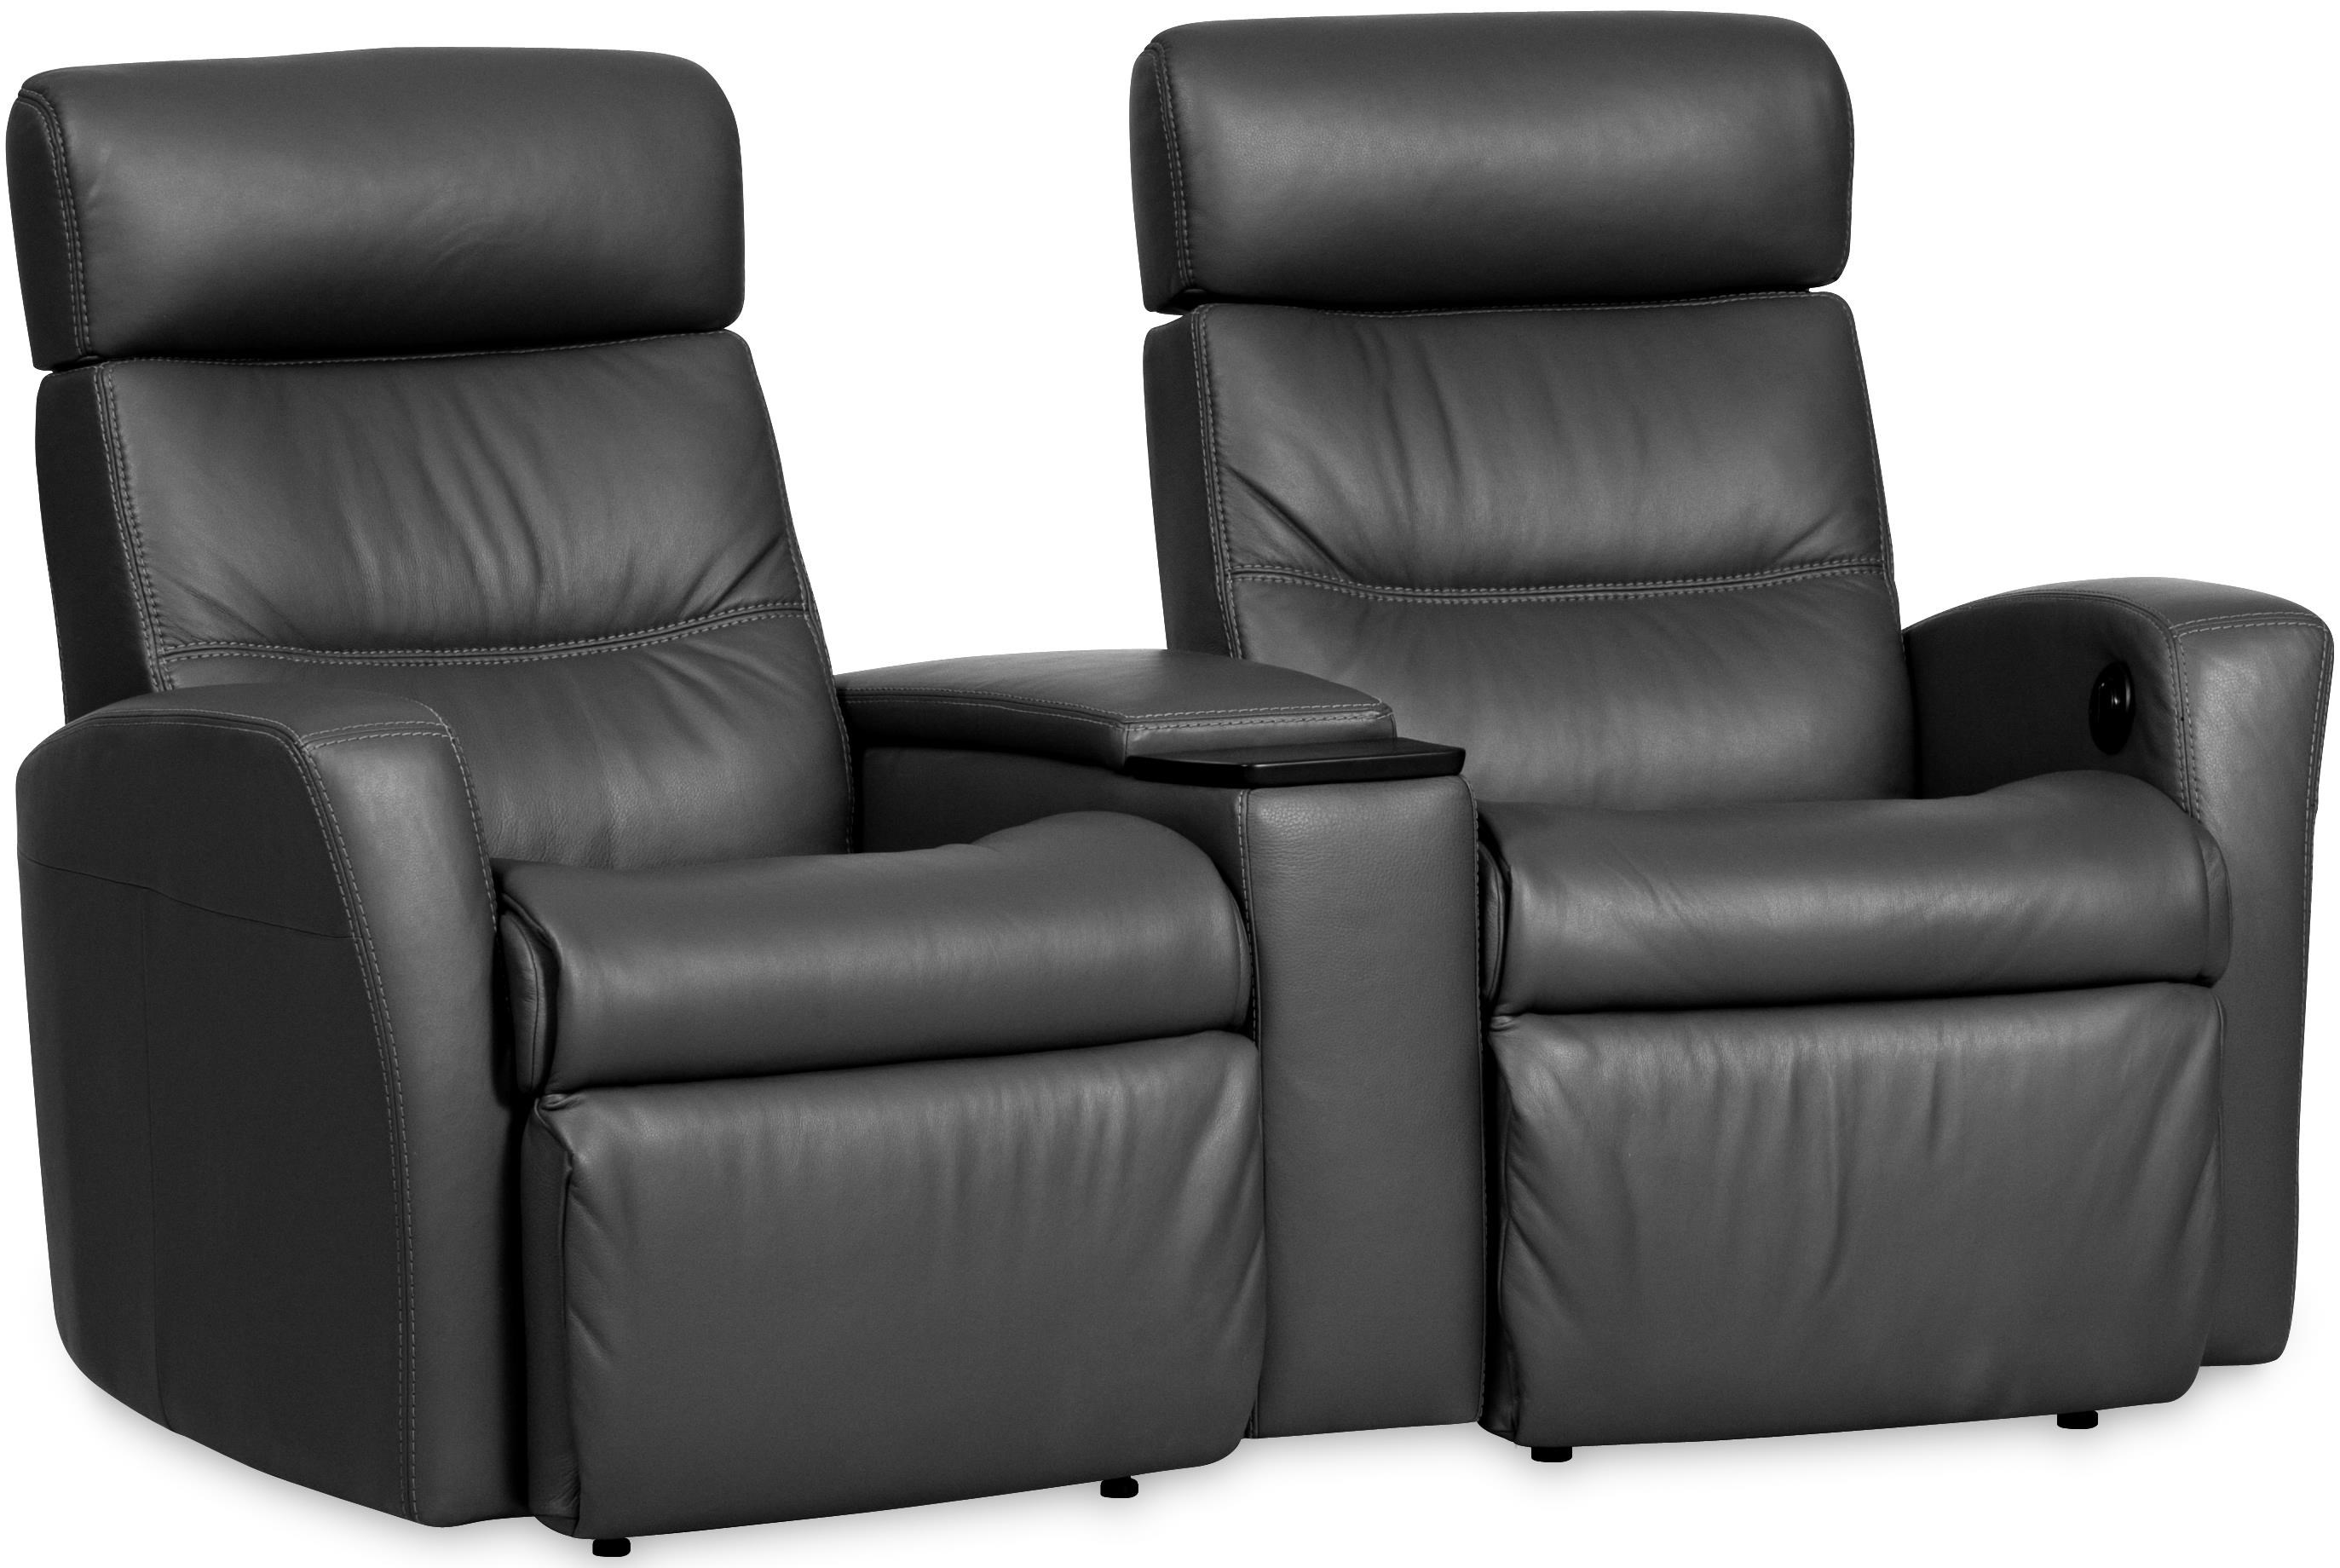 Vendor 508 Divani Home Theater Seating ...